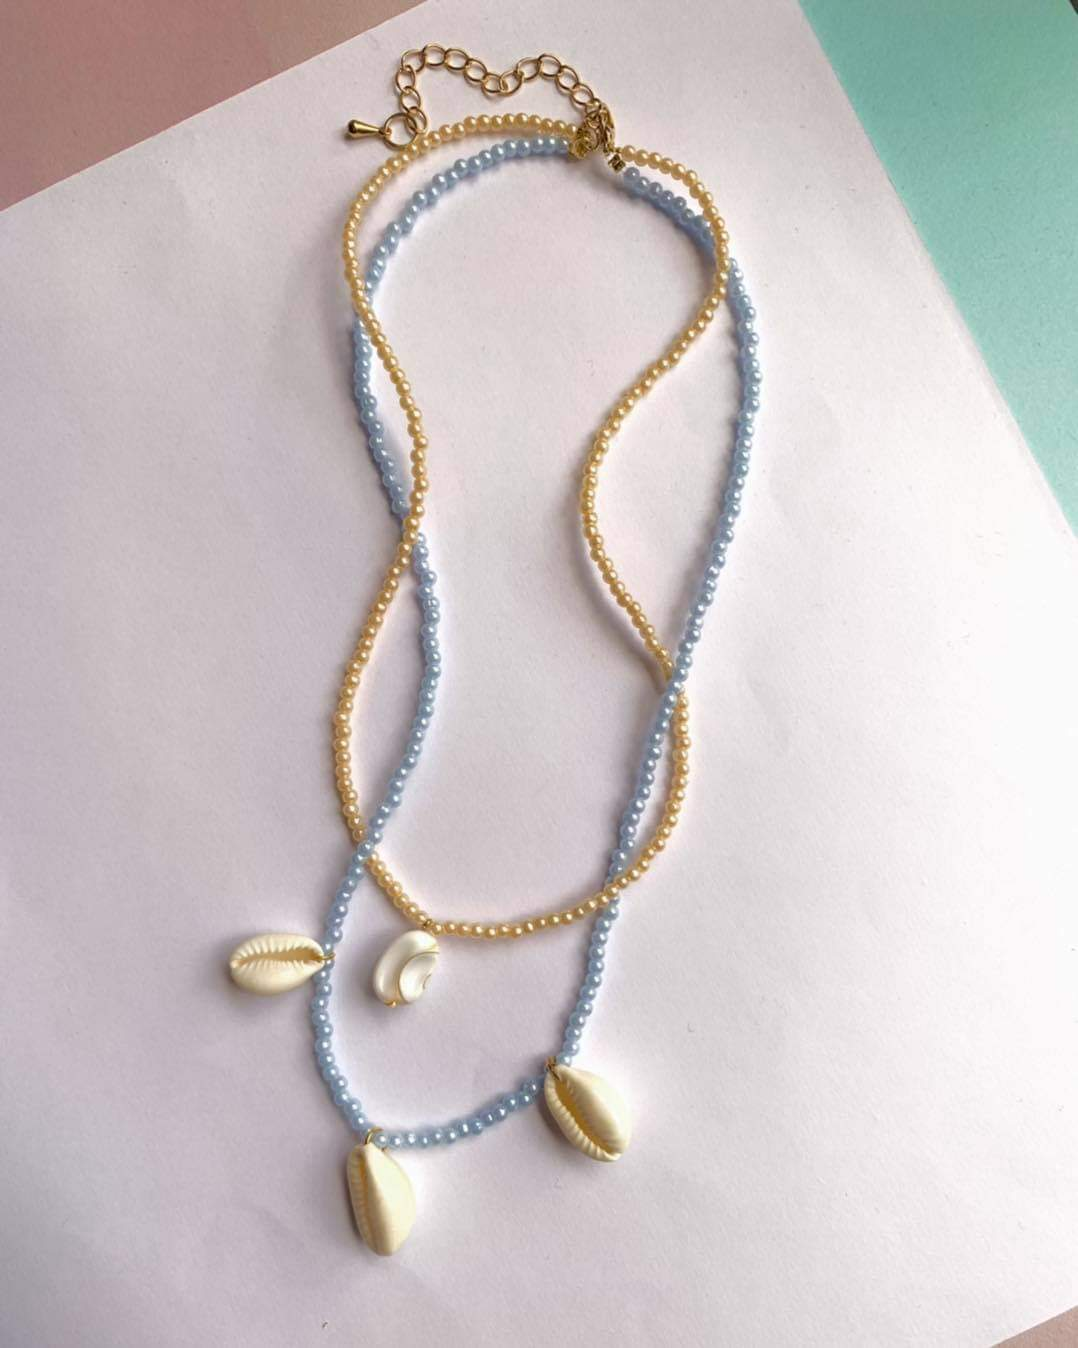 Pastel Pearls Necklaces by Mereketé | Inspire Me Latin America